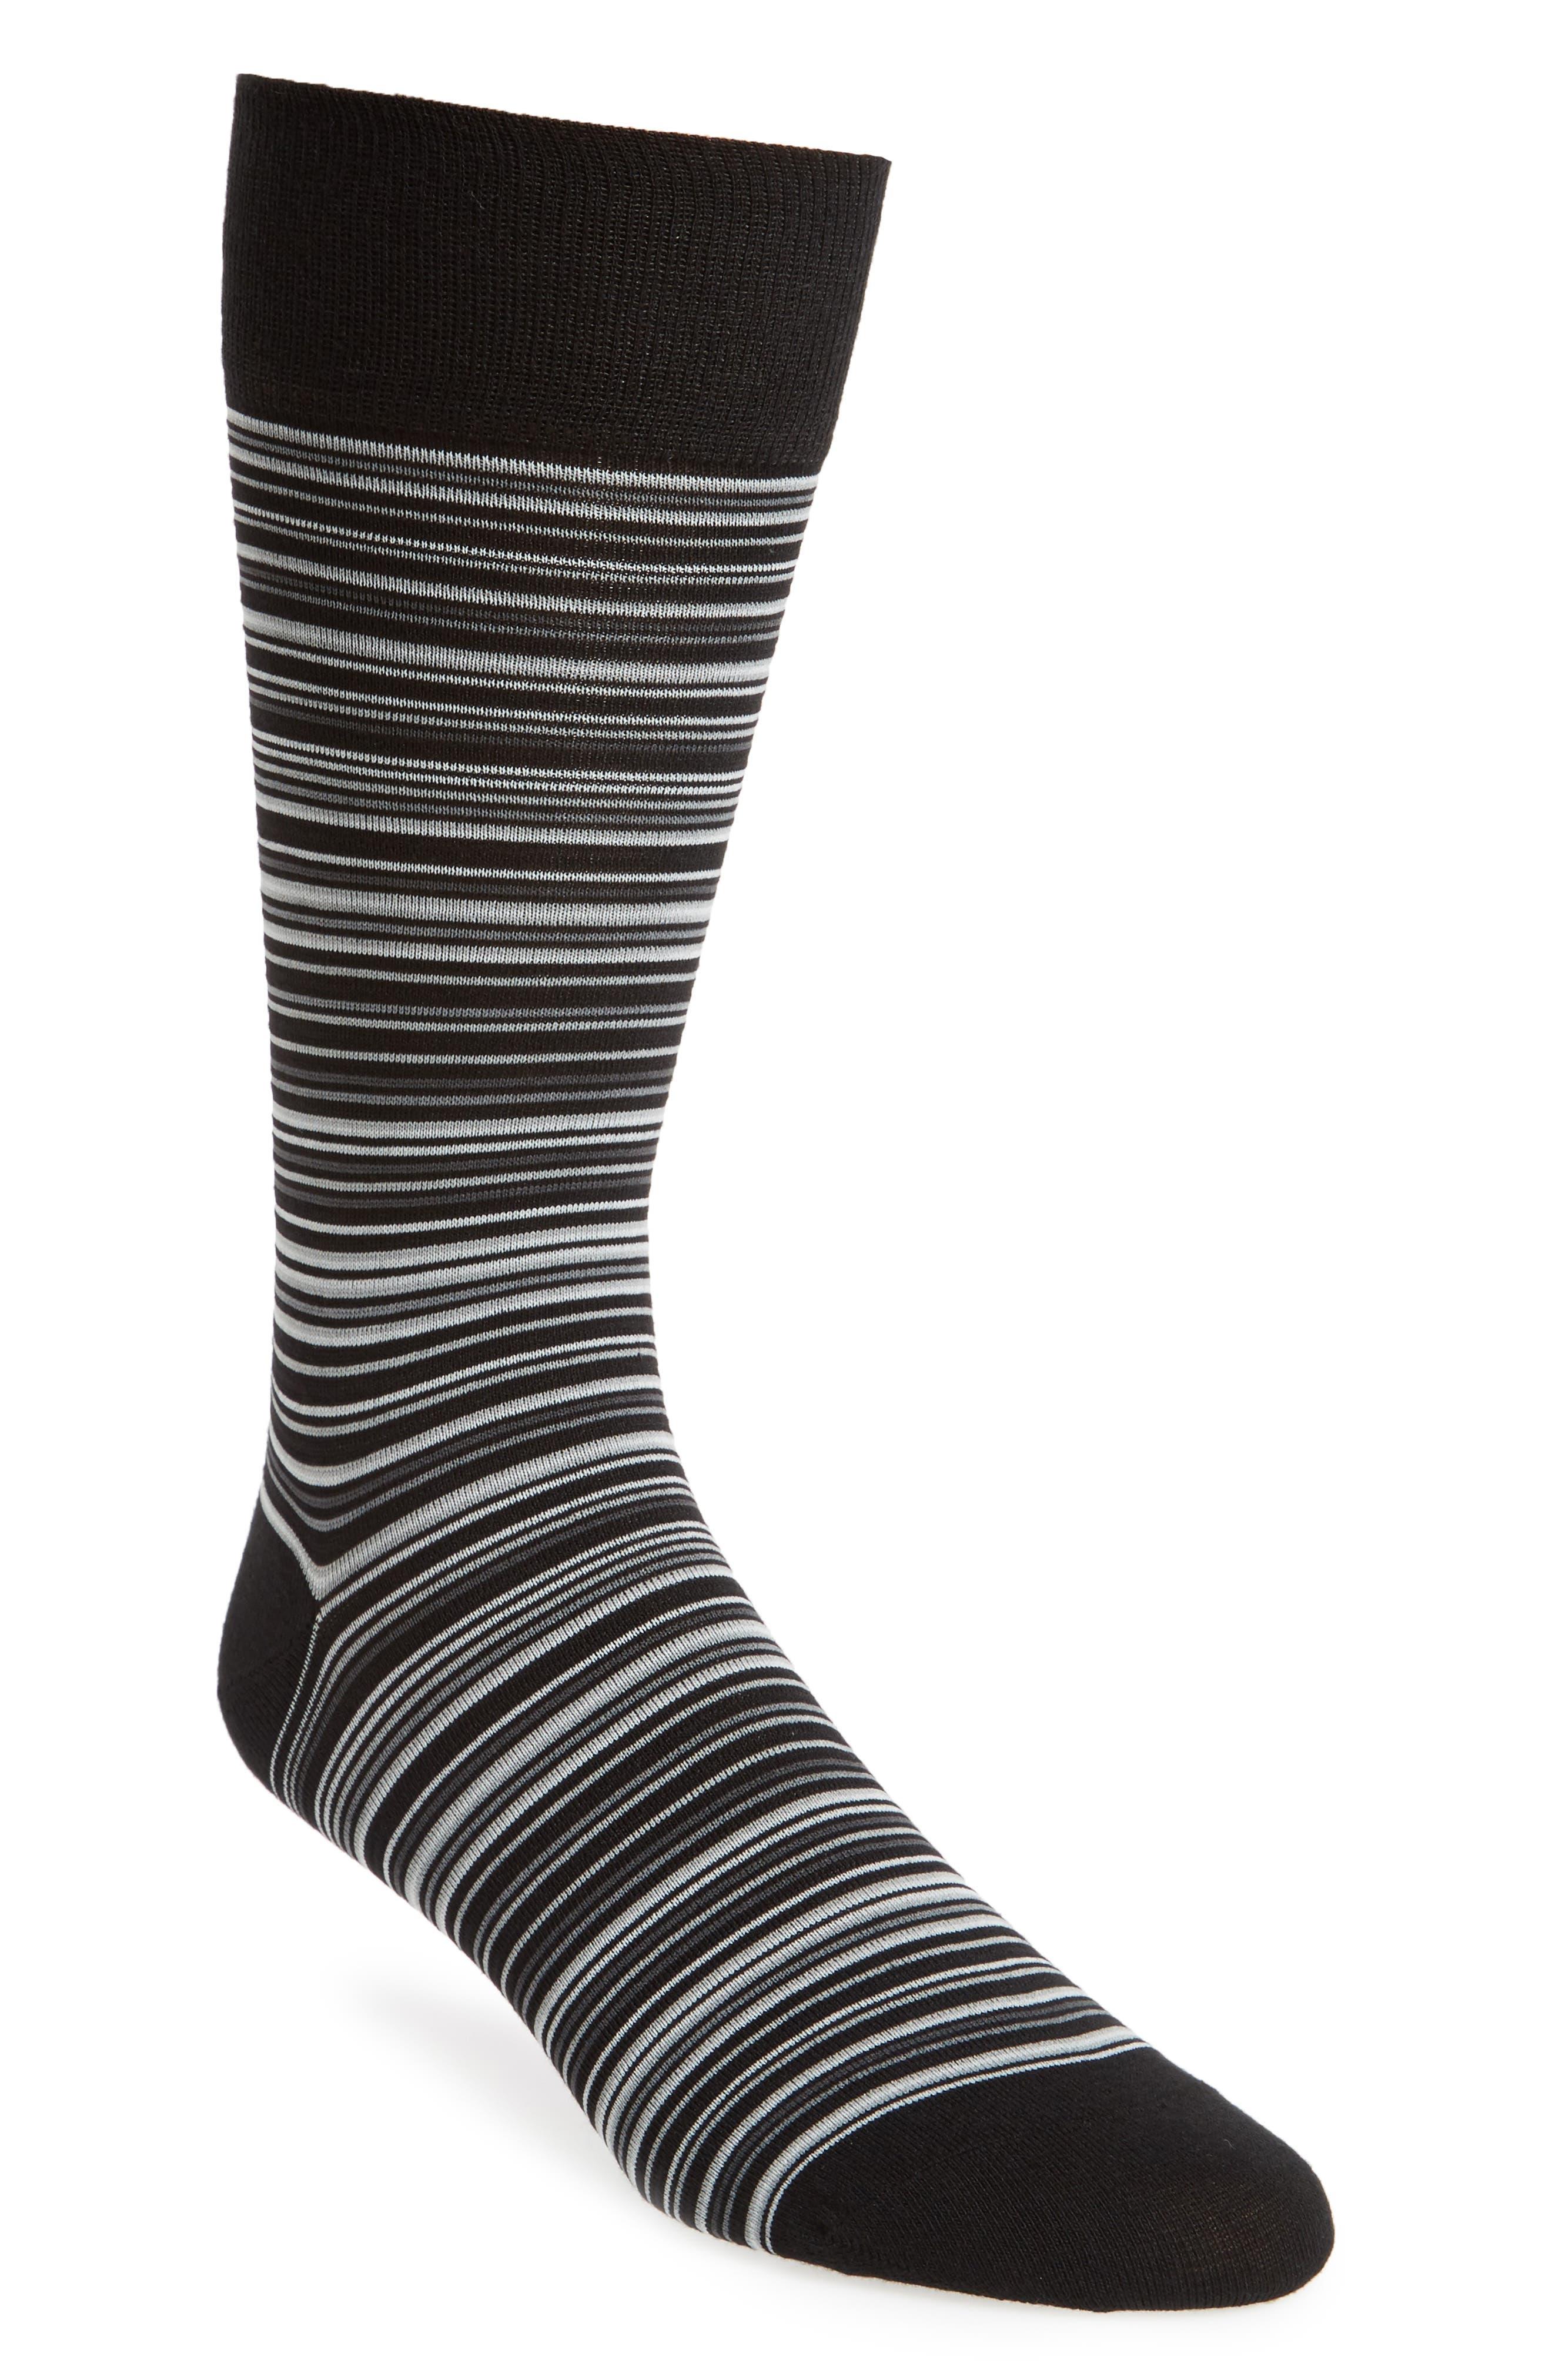 COLE HAAN, Multistripe Crew Socks, Main thumbnail 1, color, BLACK/ GREY